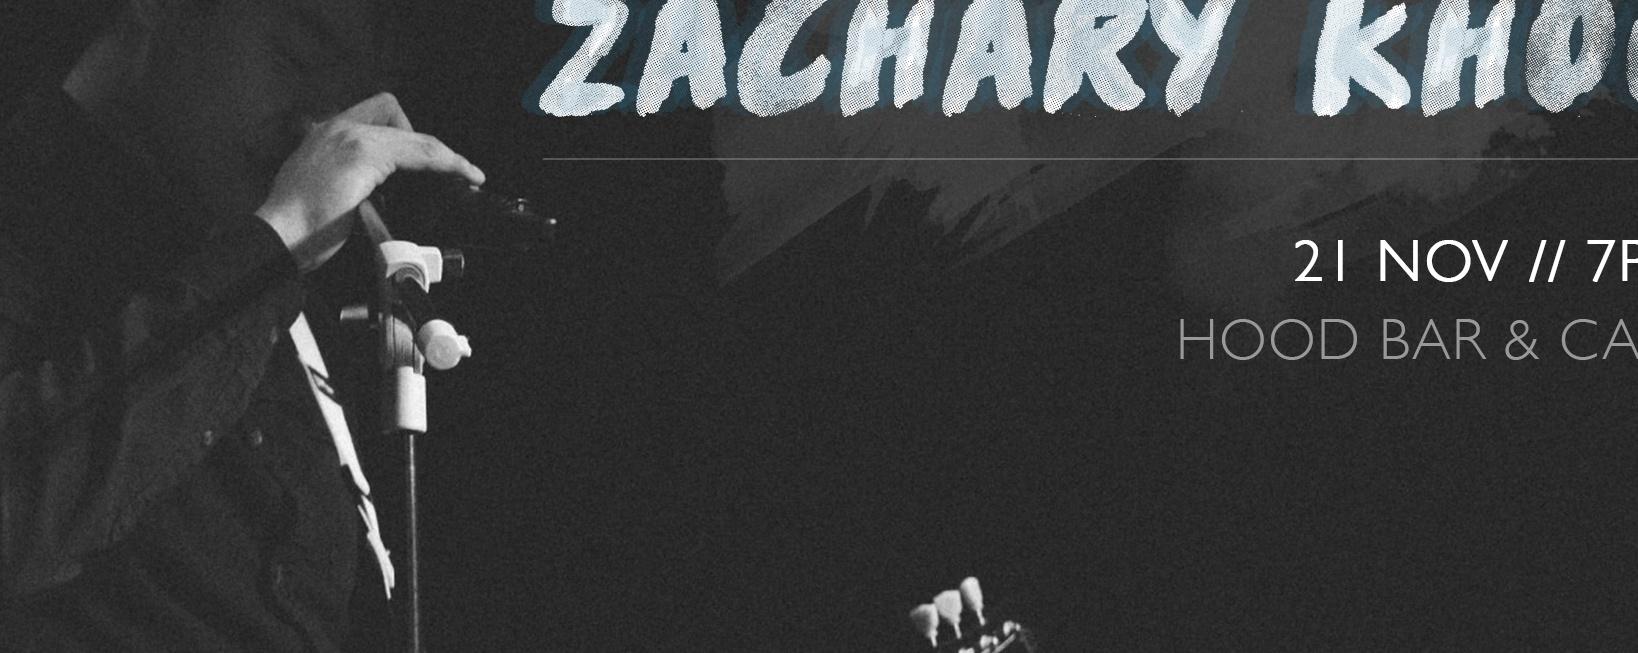 ZACHARY KHOO